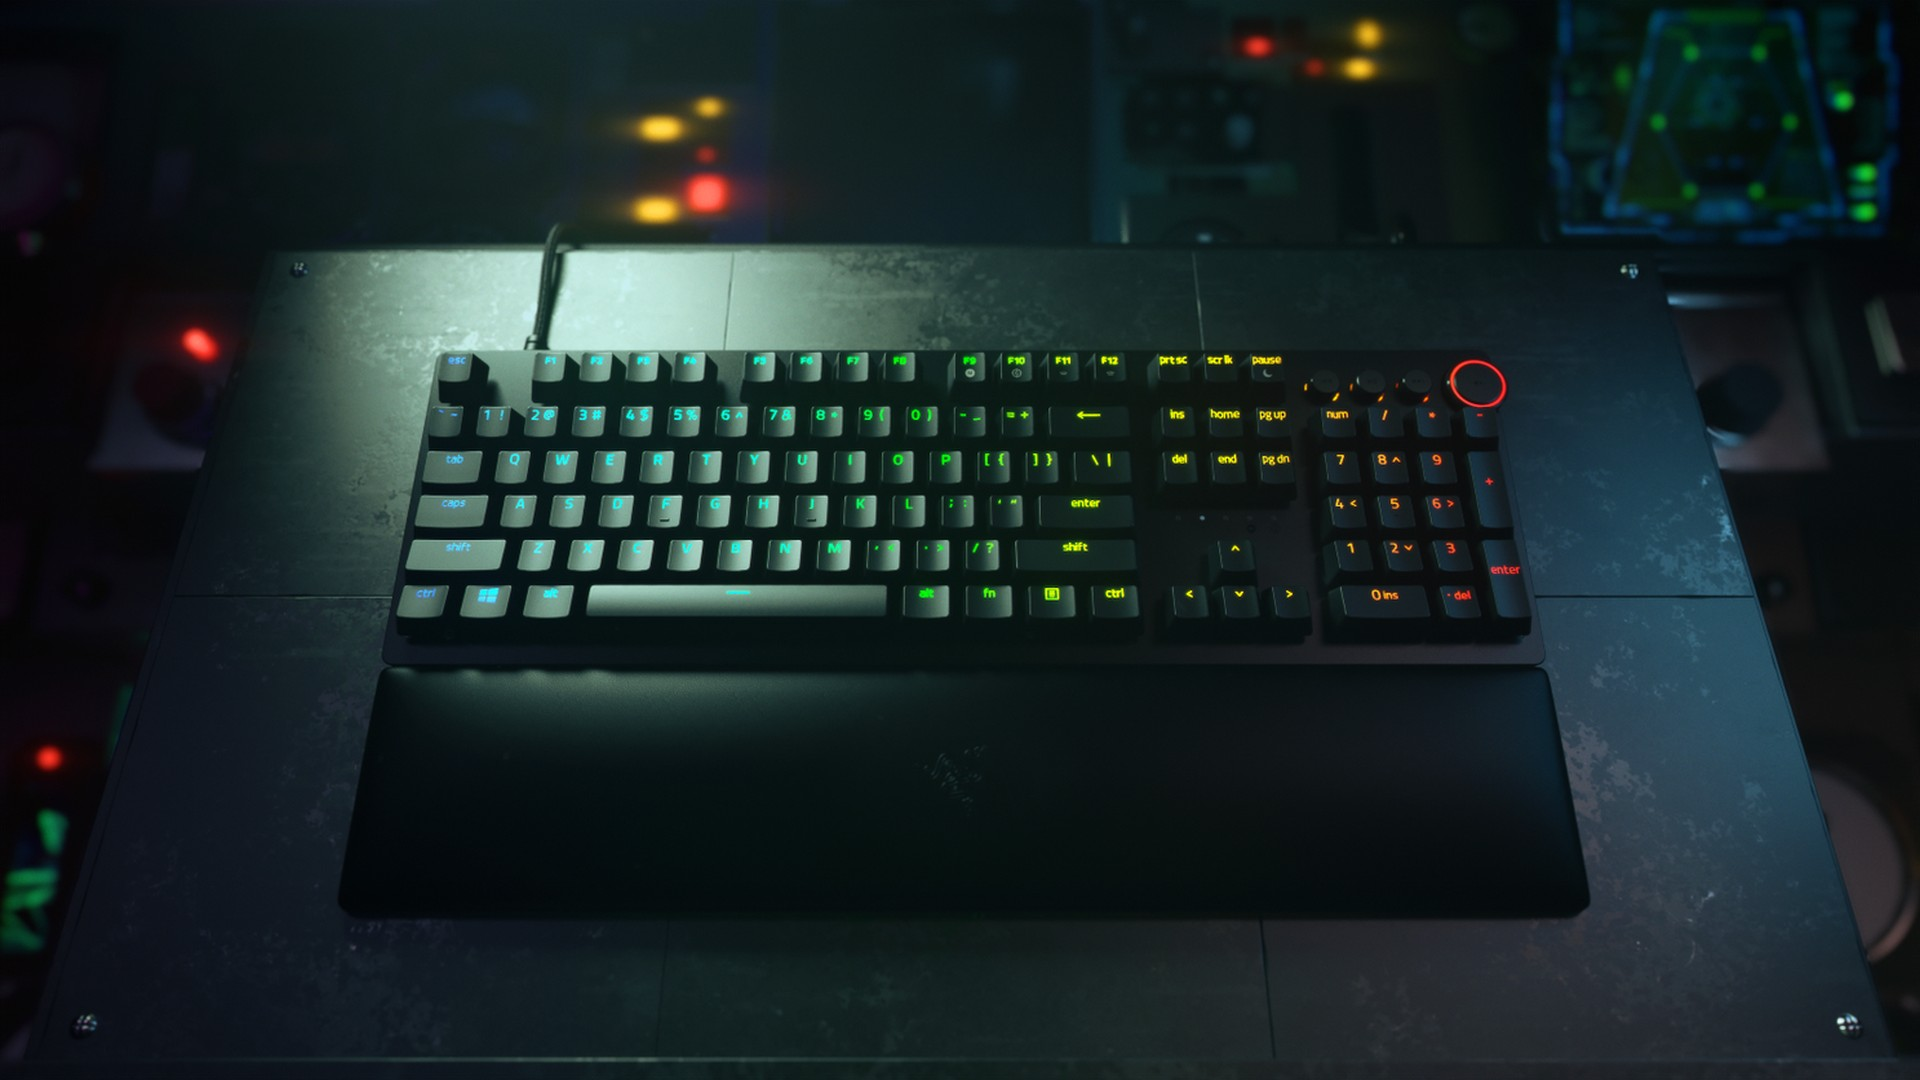 Meet The World's Fastest Keyboard – The New Razer Huntsman V